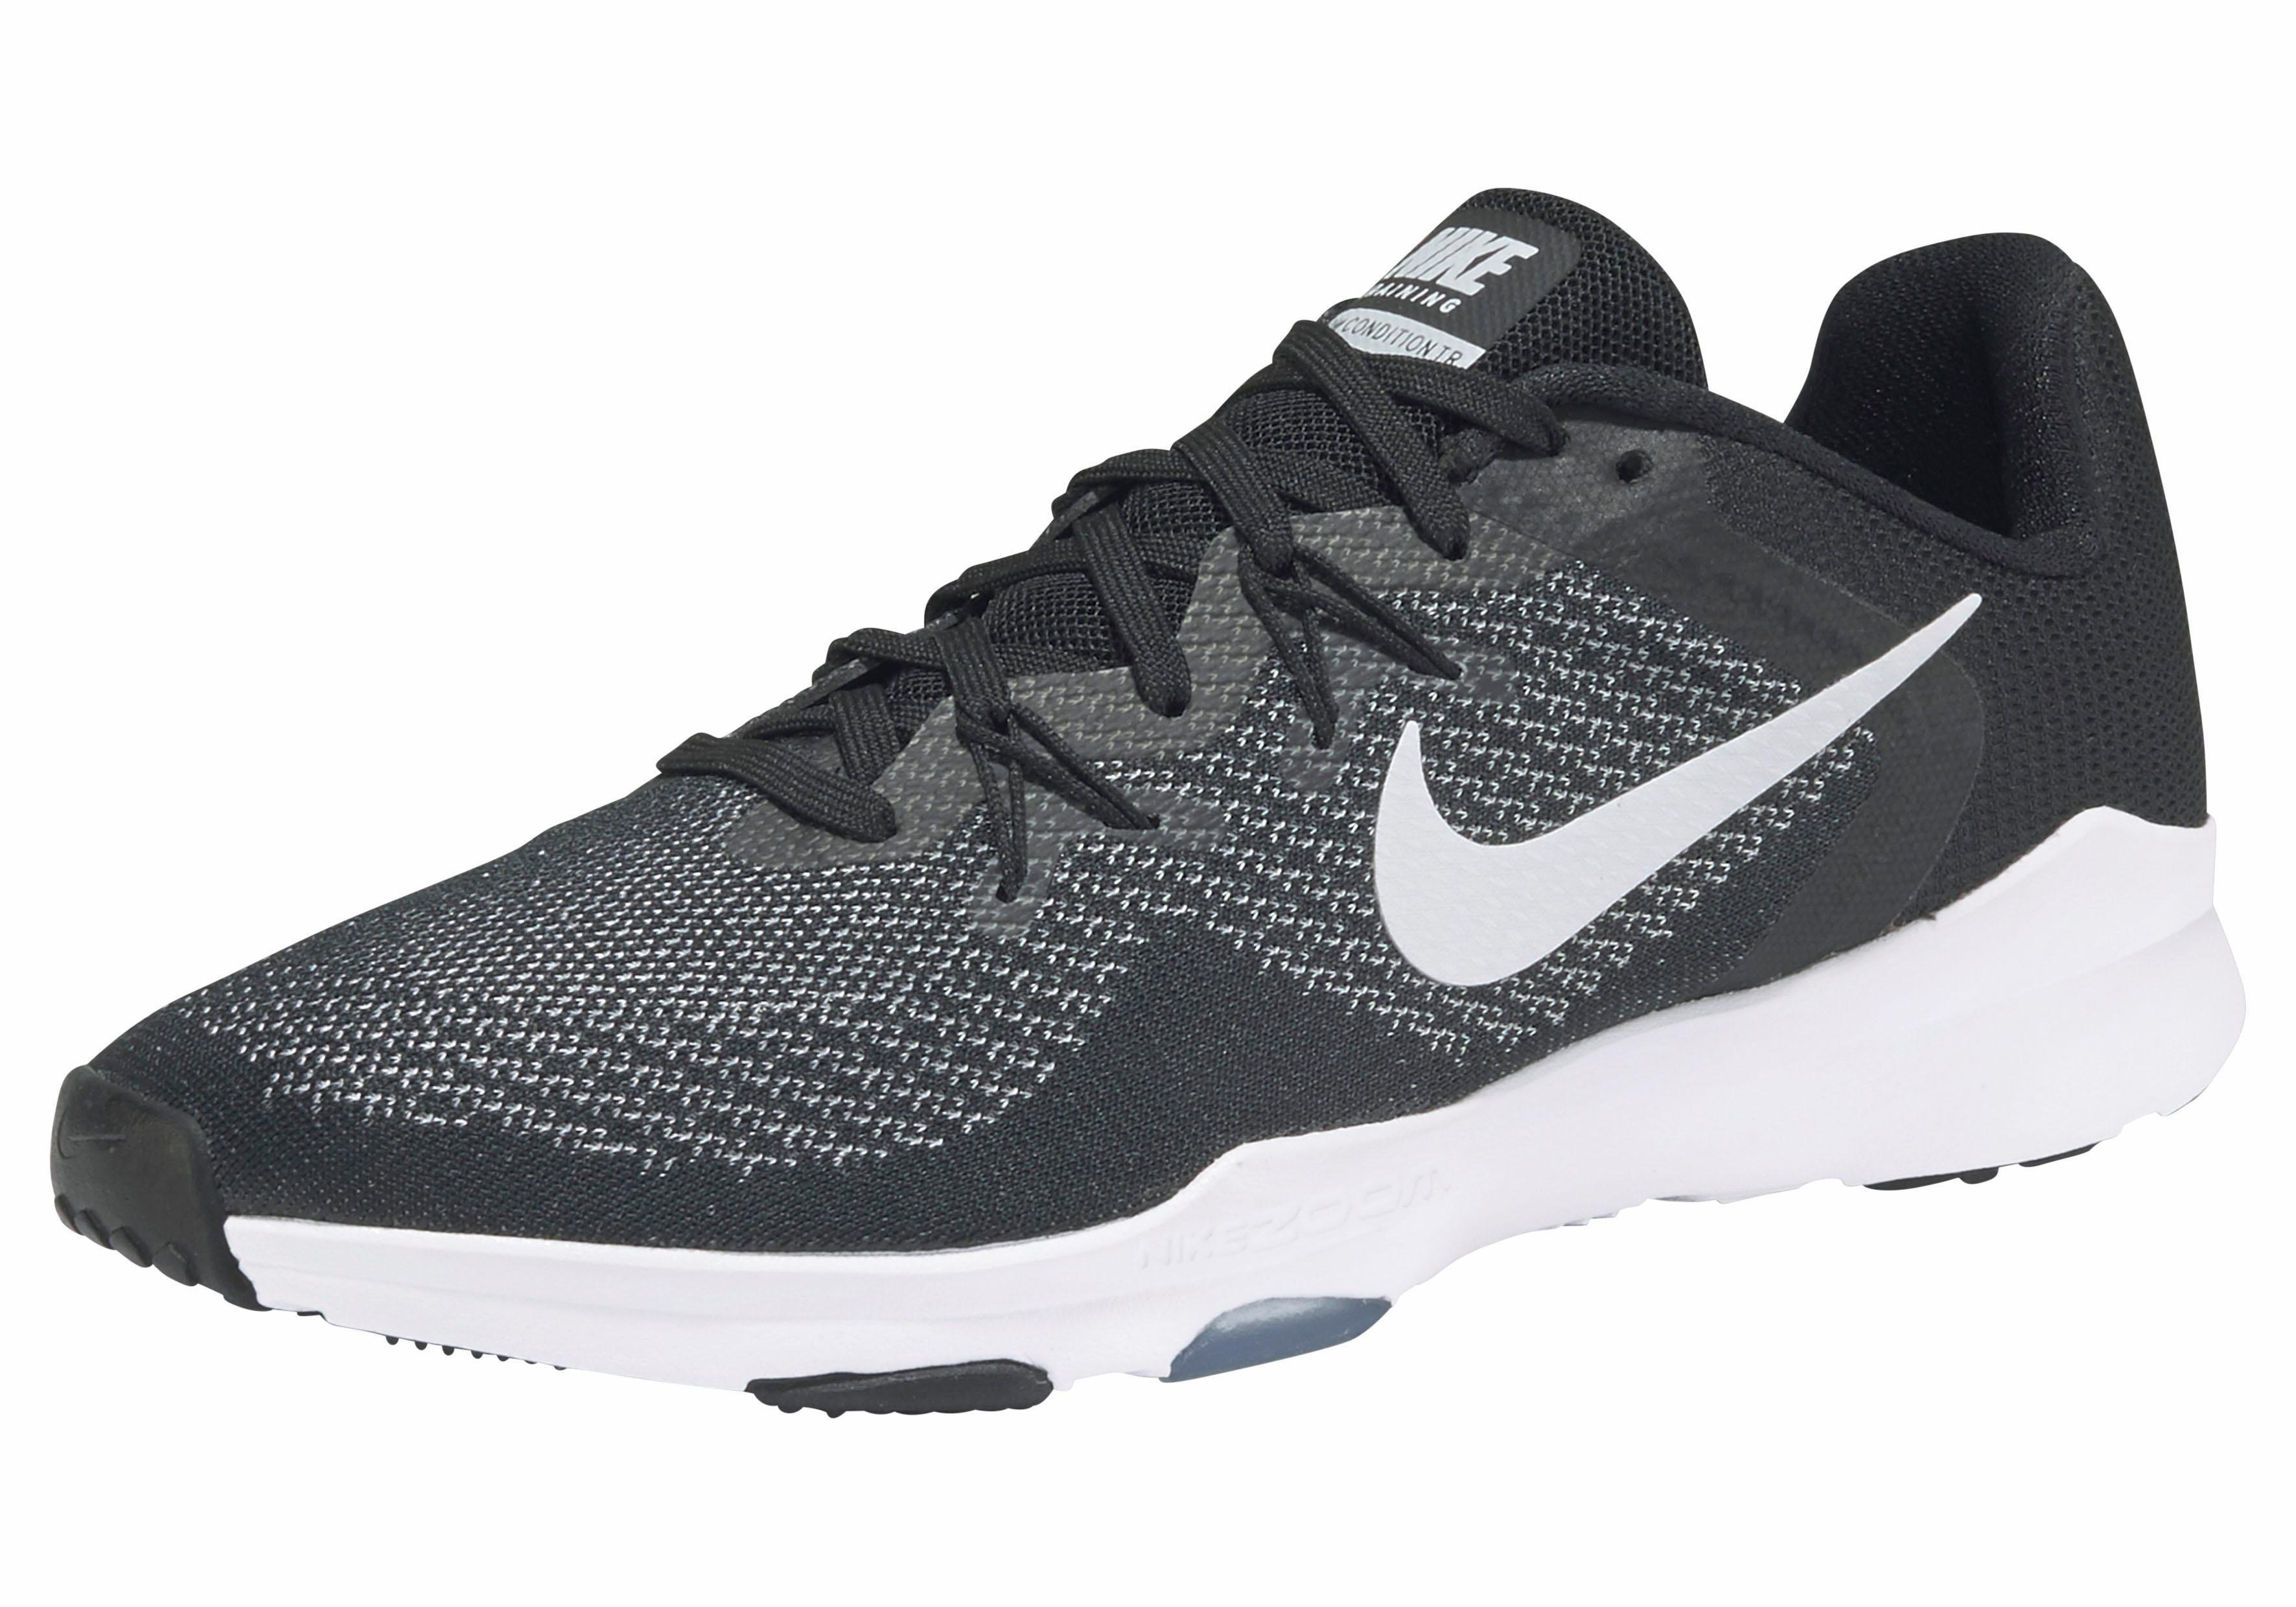 separation shoes 19c0b 277ce Afbeeldingsbron Nike fitnessschoenen »Wmns Zoom Condition TR 2«